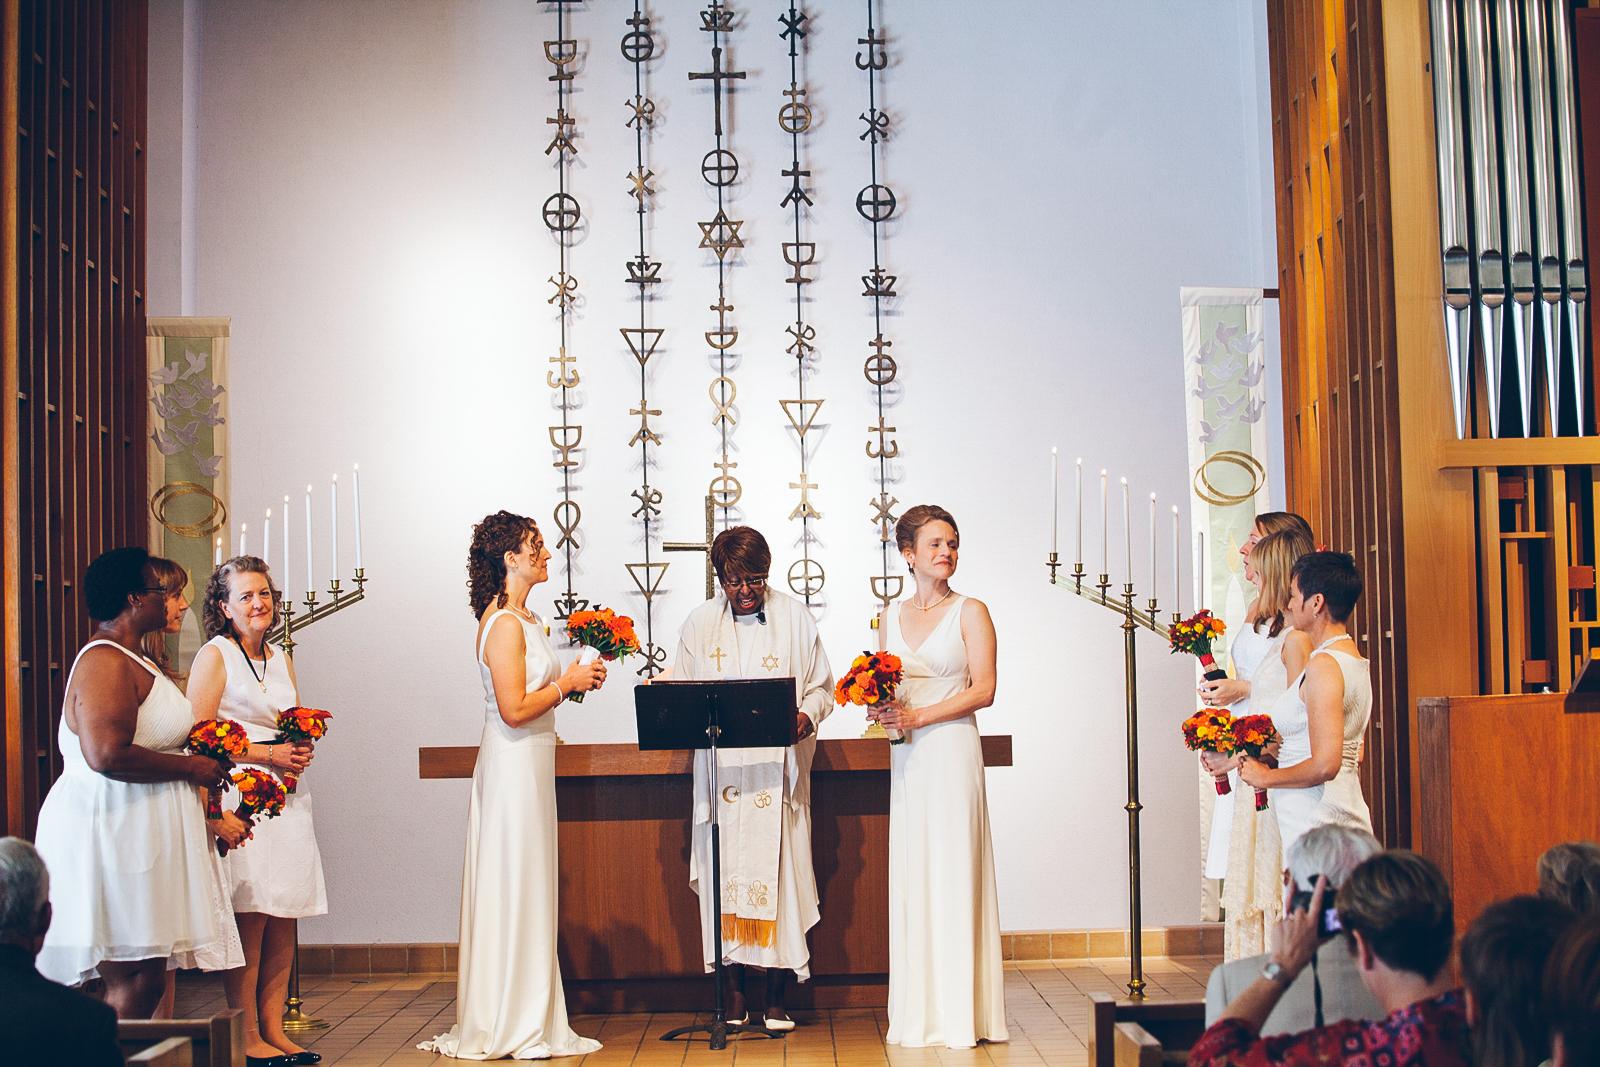 Riverside_ca_wedding_photography_marguerite_carolyn_ebony_siovhan_bokeh_photography_27.jpg